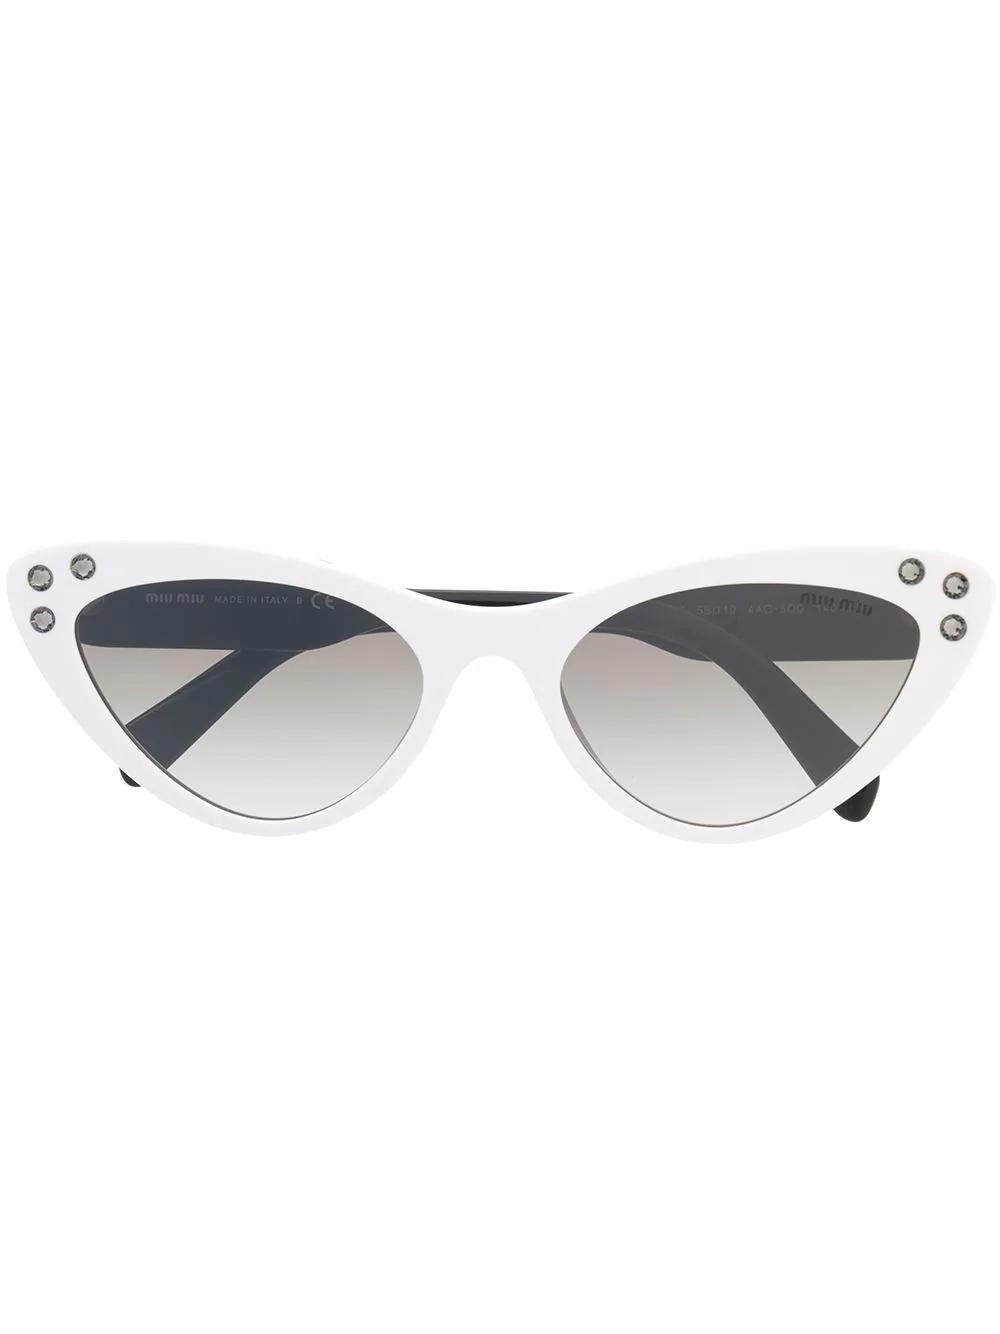 4e9fc976d87 Miu Miu Eyewear Cat-Eye-Sonnenbrille - Schwarz In Black